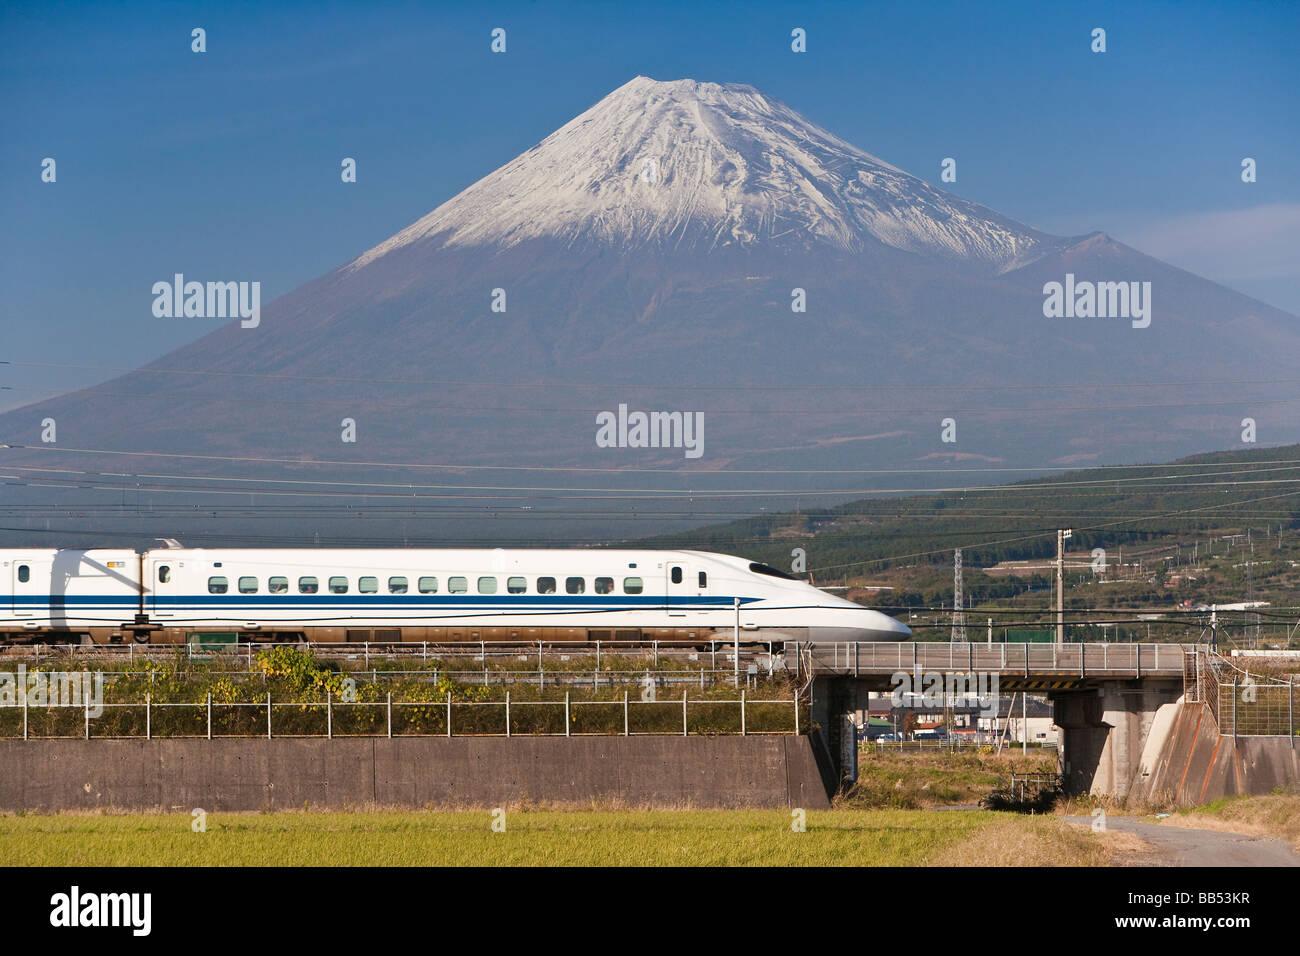 Shinkansen Japanese Bullet Train And Mount Fuji Houshu Japan Asia Stock Photo